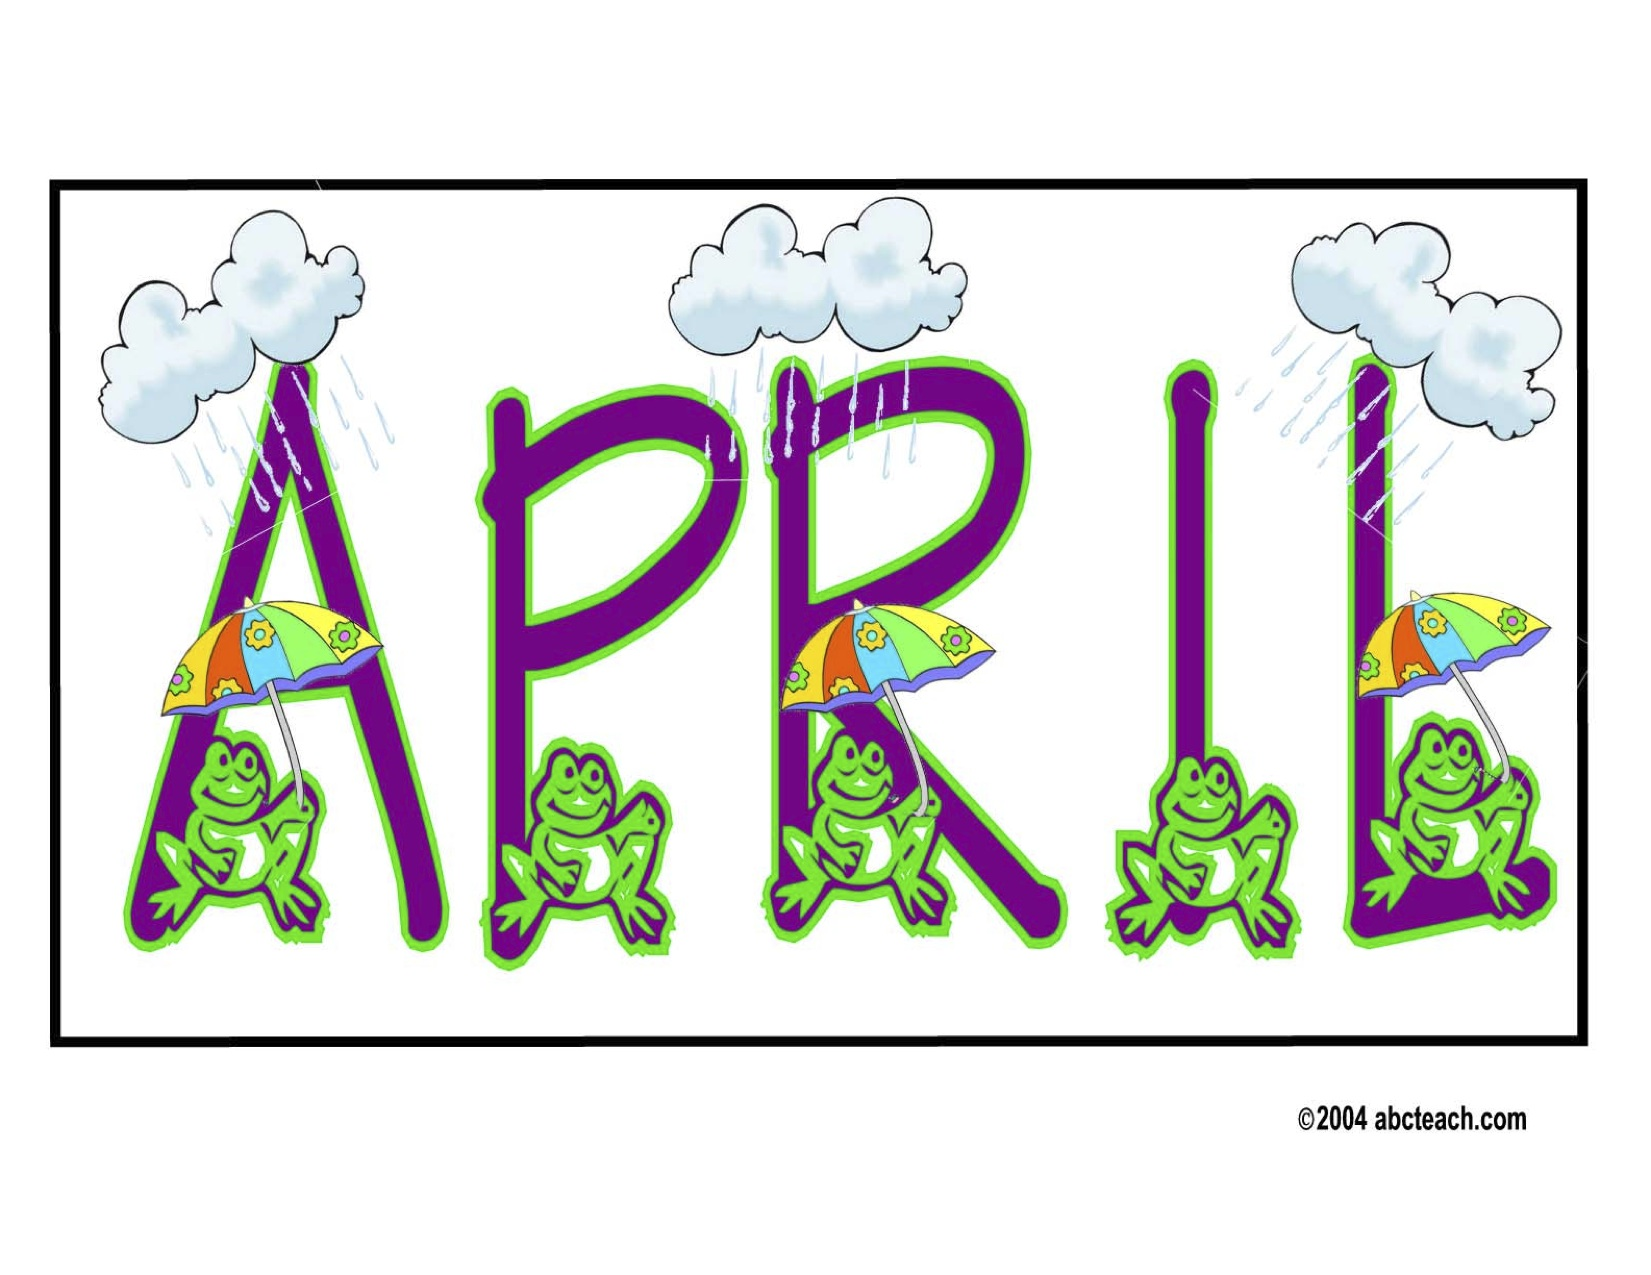 April calendar headings clipart clipart transparent download April calendar headings clipart - ClipartFest clipart transparent download